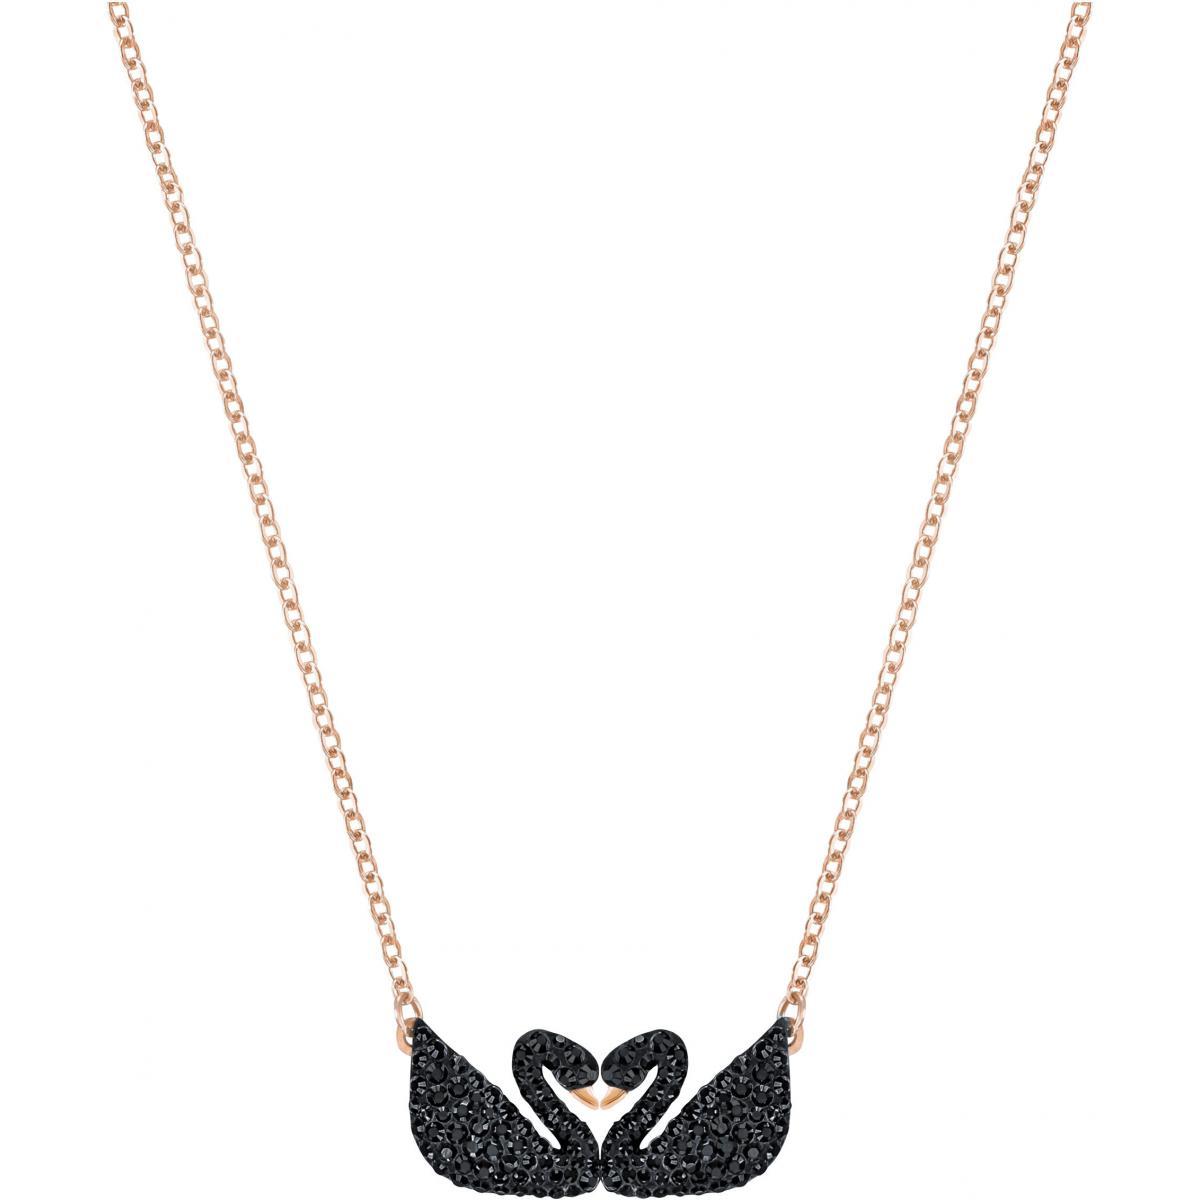 Collier et pendentif Swarovski 5296468 - Collier et pendentif Cygnes Sertis  Femme